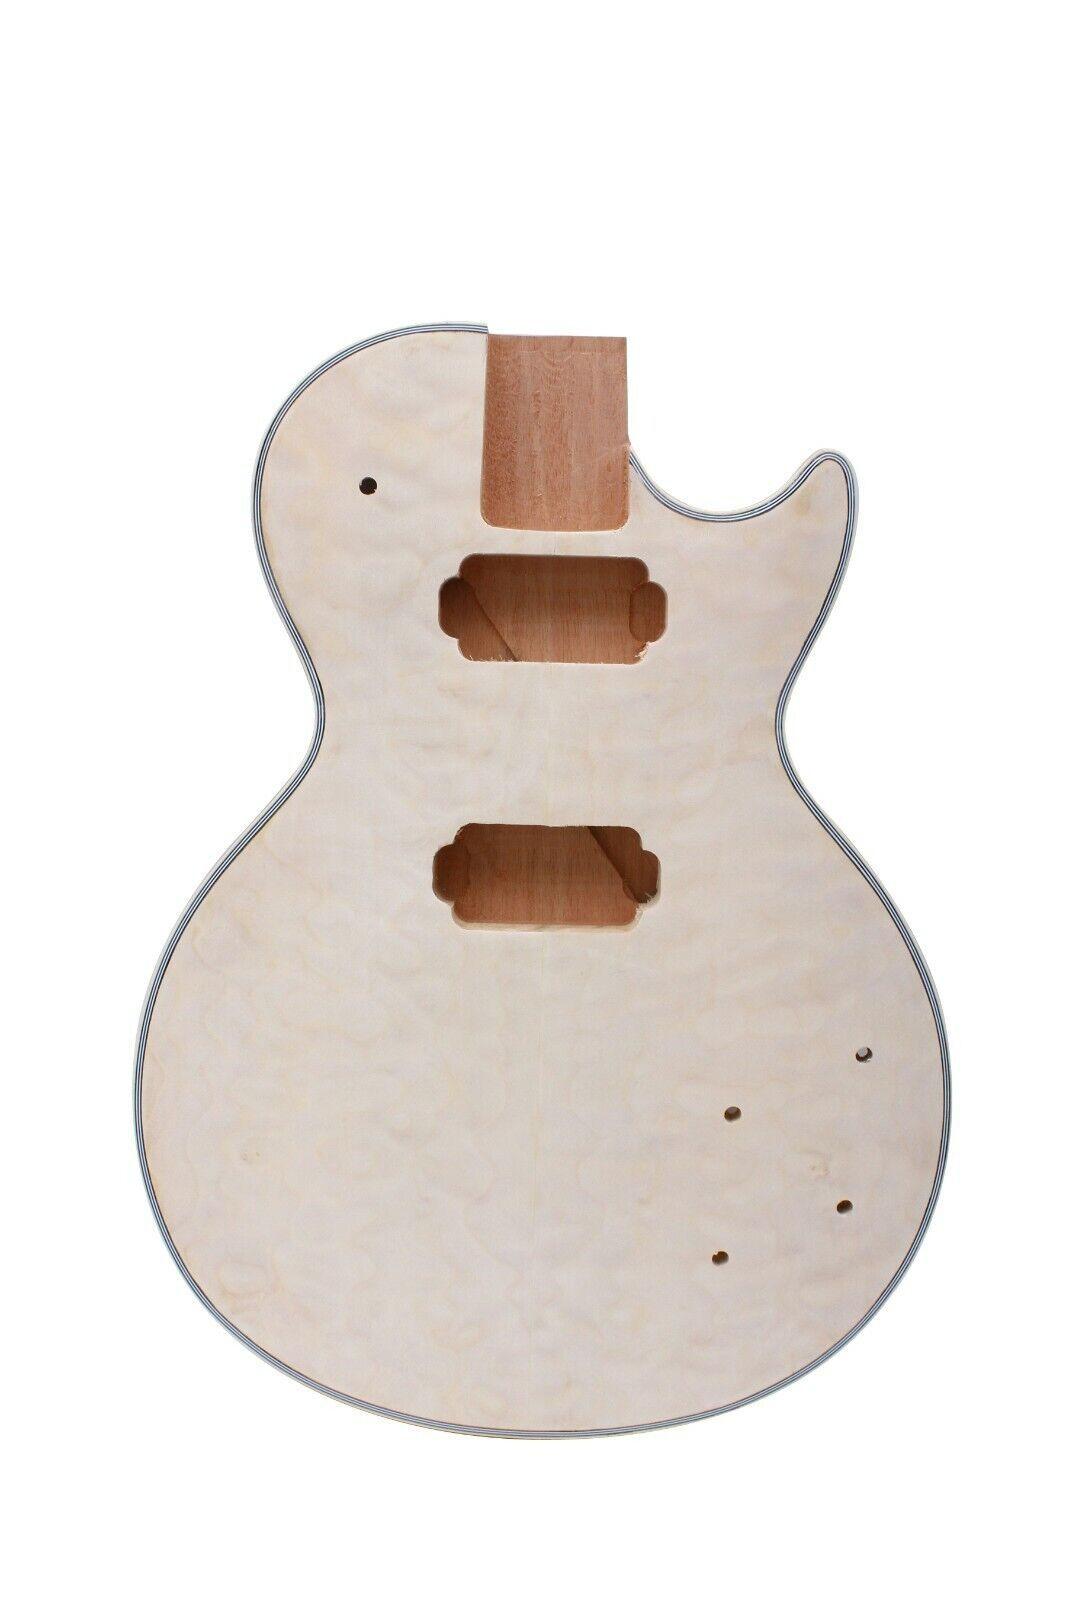 Diy Electric Guitar Body Mahogany Quilt Maple Veneer Unfinished LP